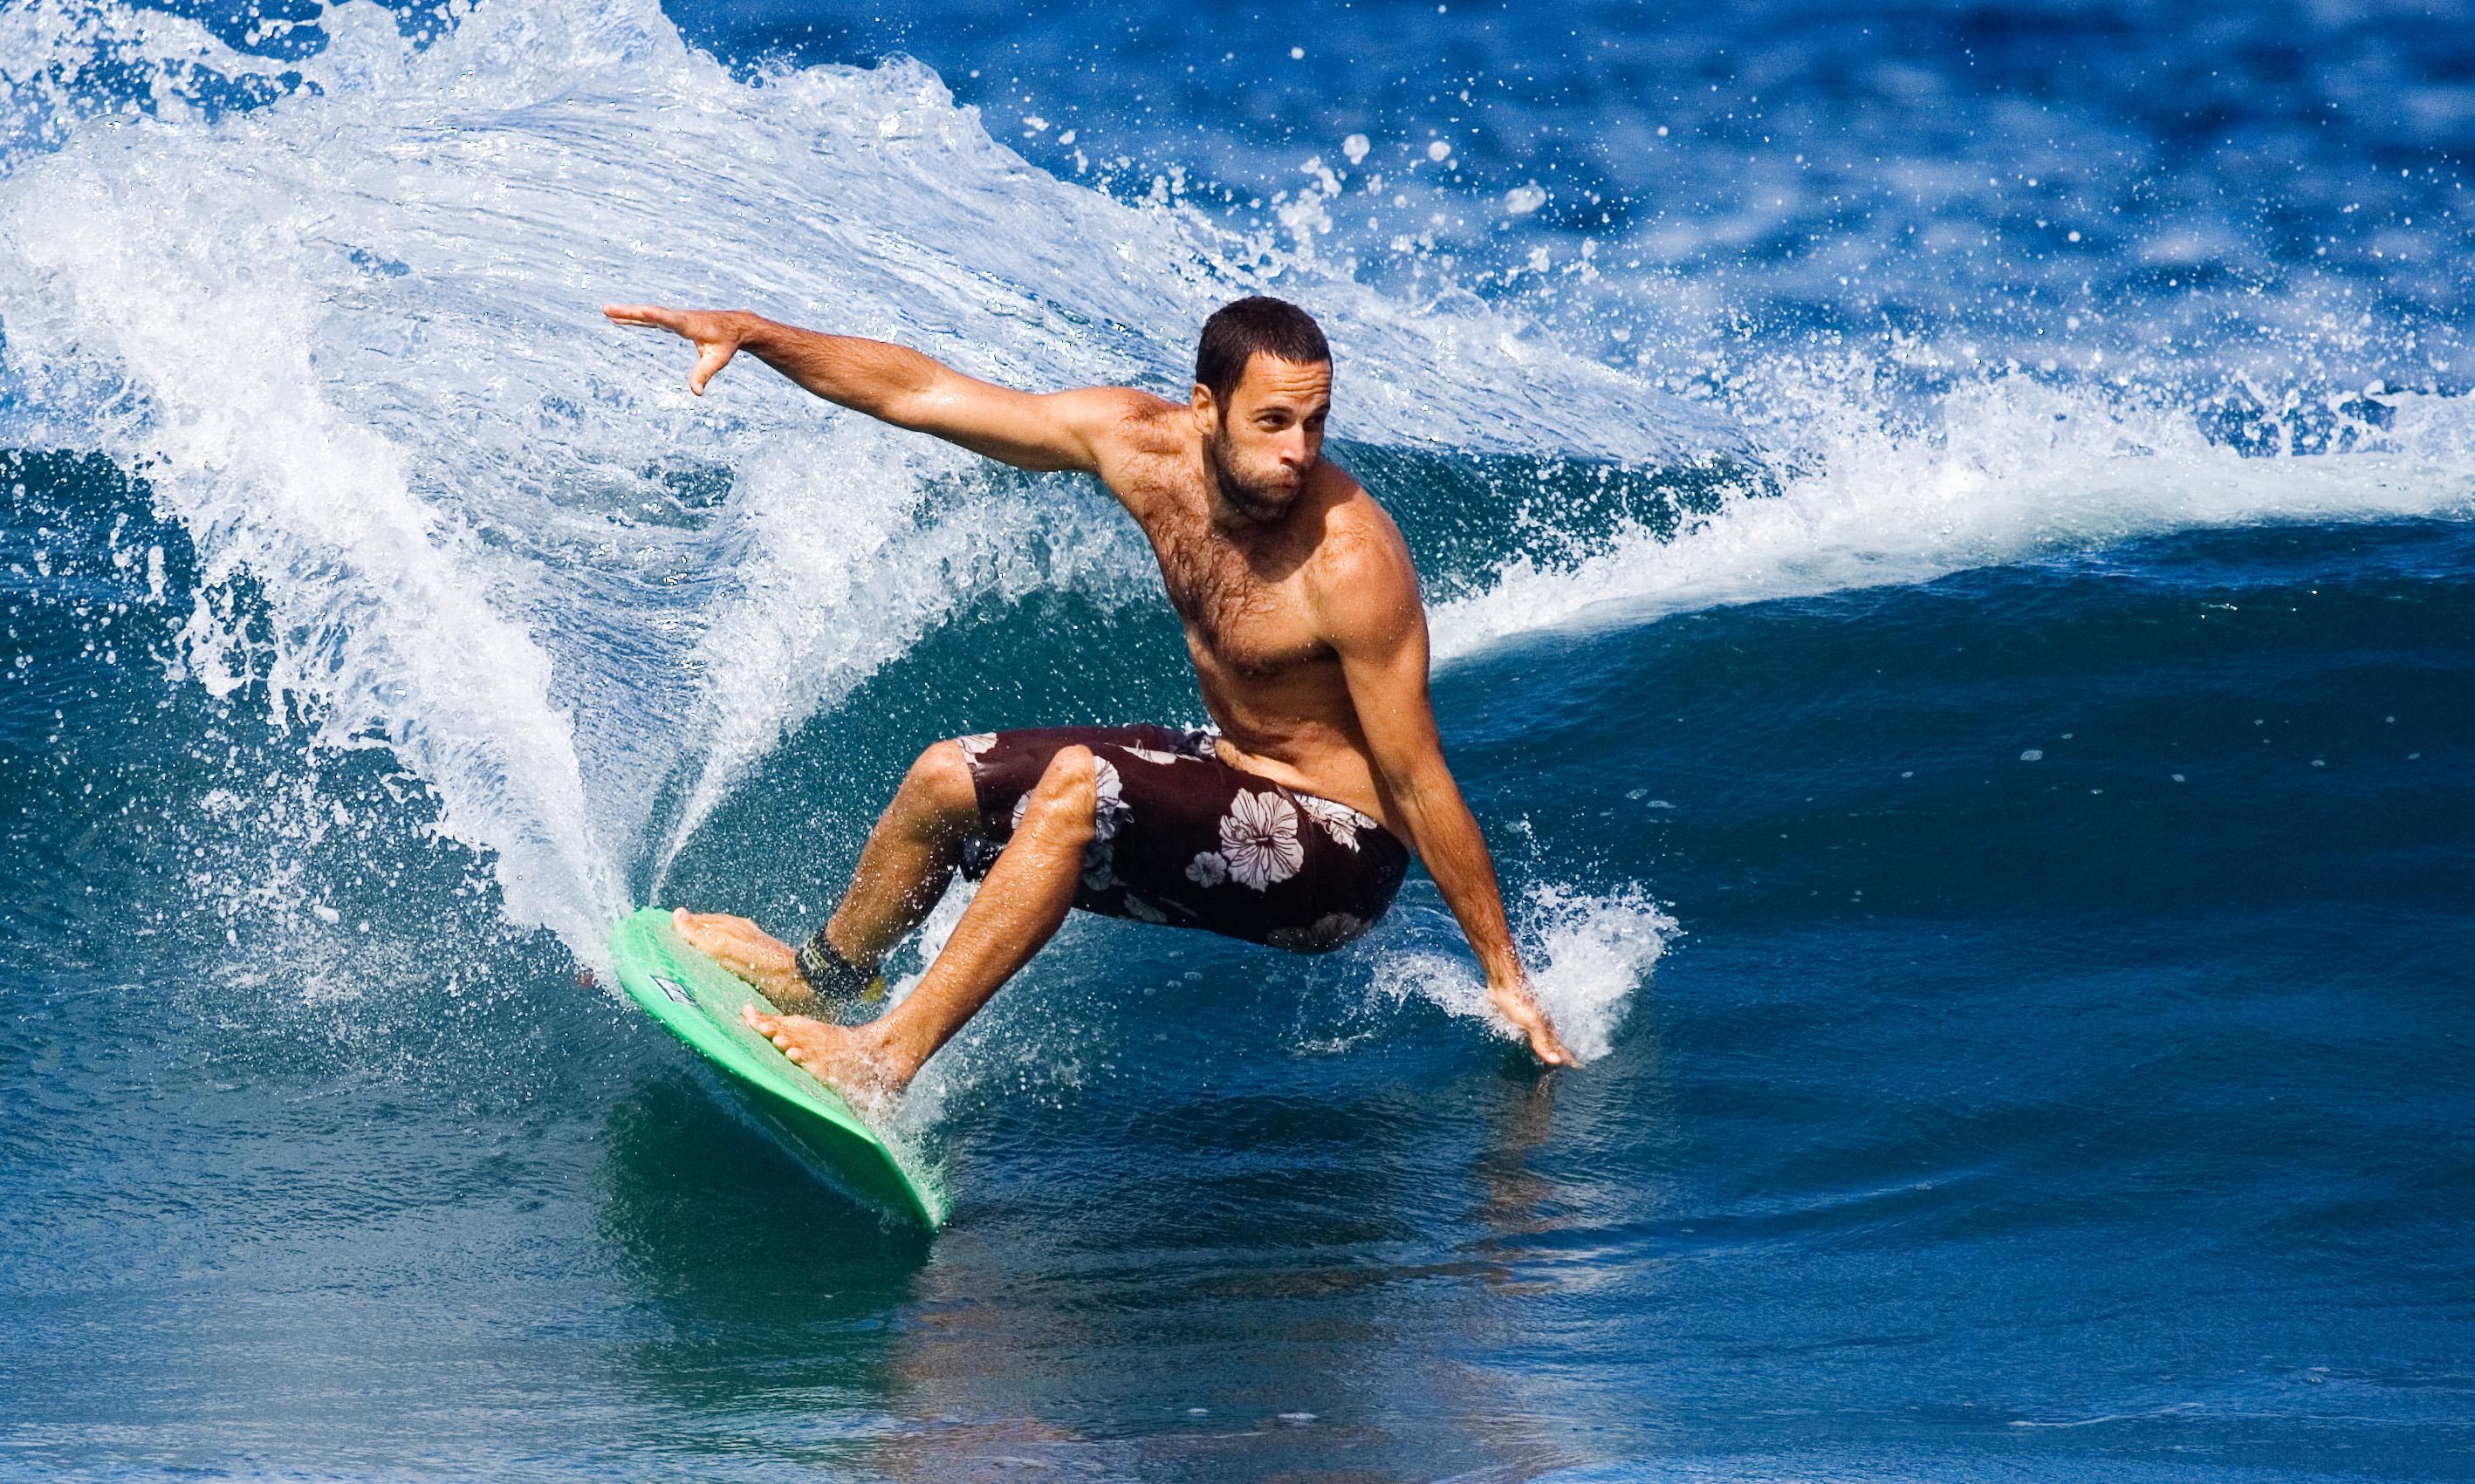 wayne dean surfer - 1024×614